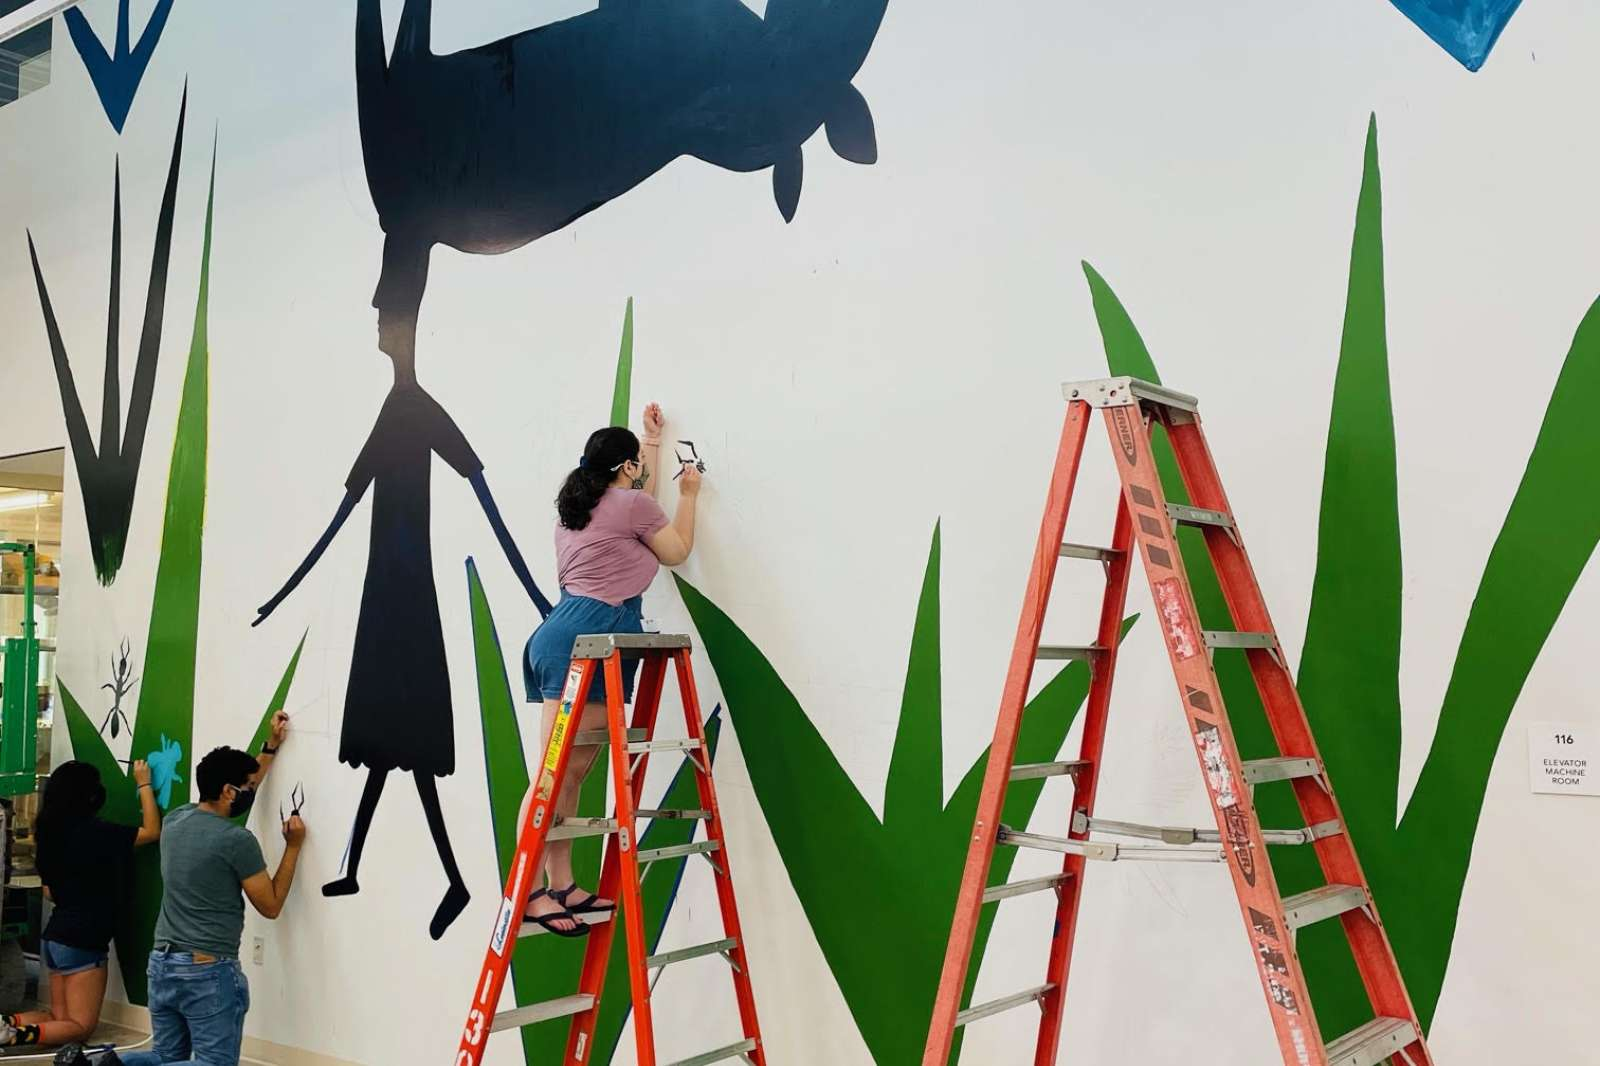 Gerardo Rosales, ¡Displaced Mundo! in progress. Photo Moody Center for the Arts